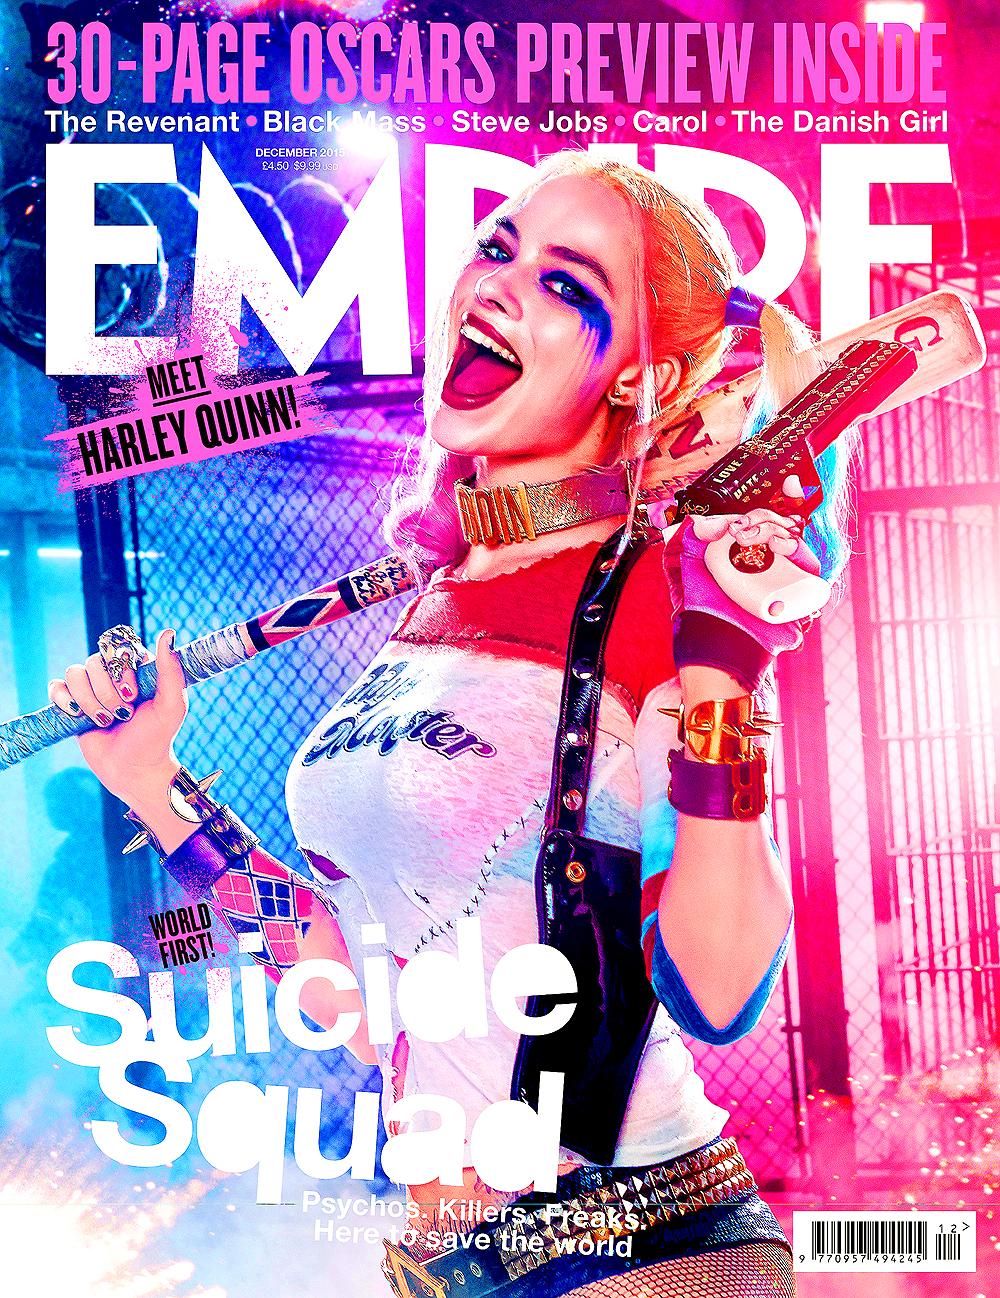 Suicide Squad - Edited Empire Magazine Cover -